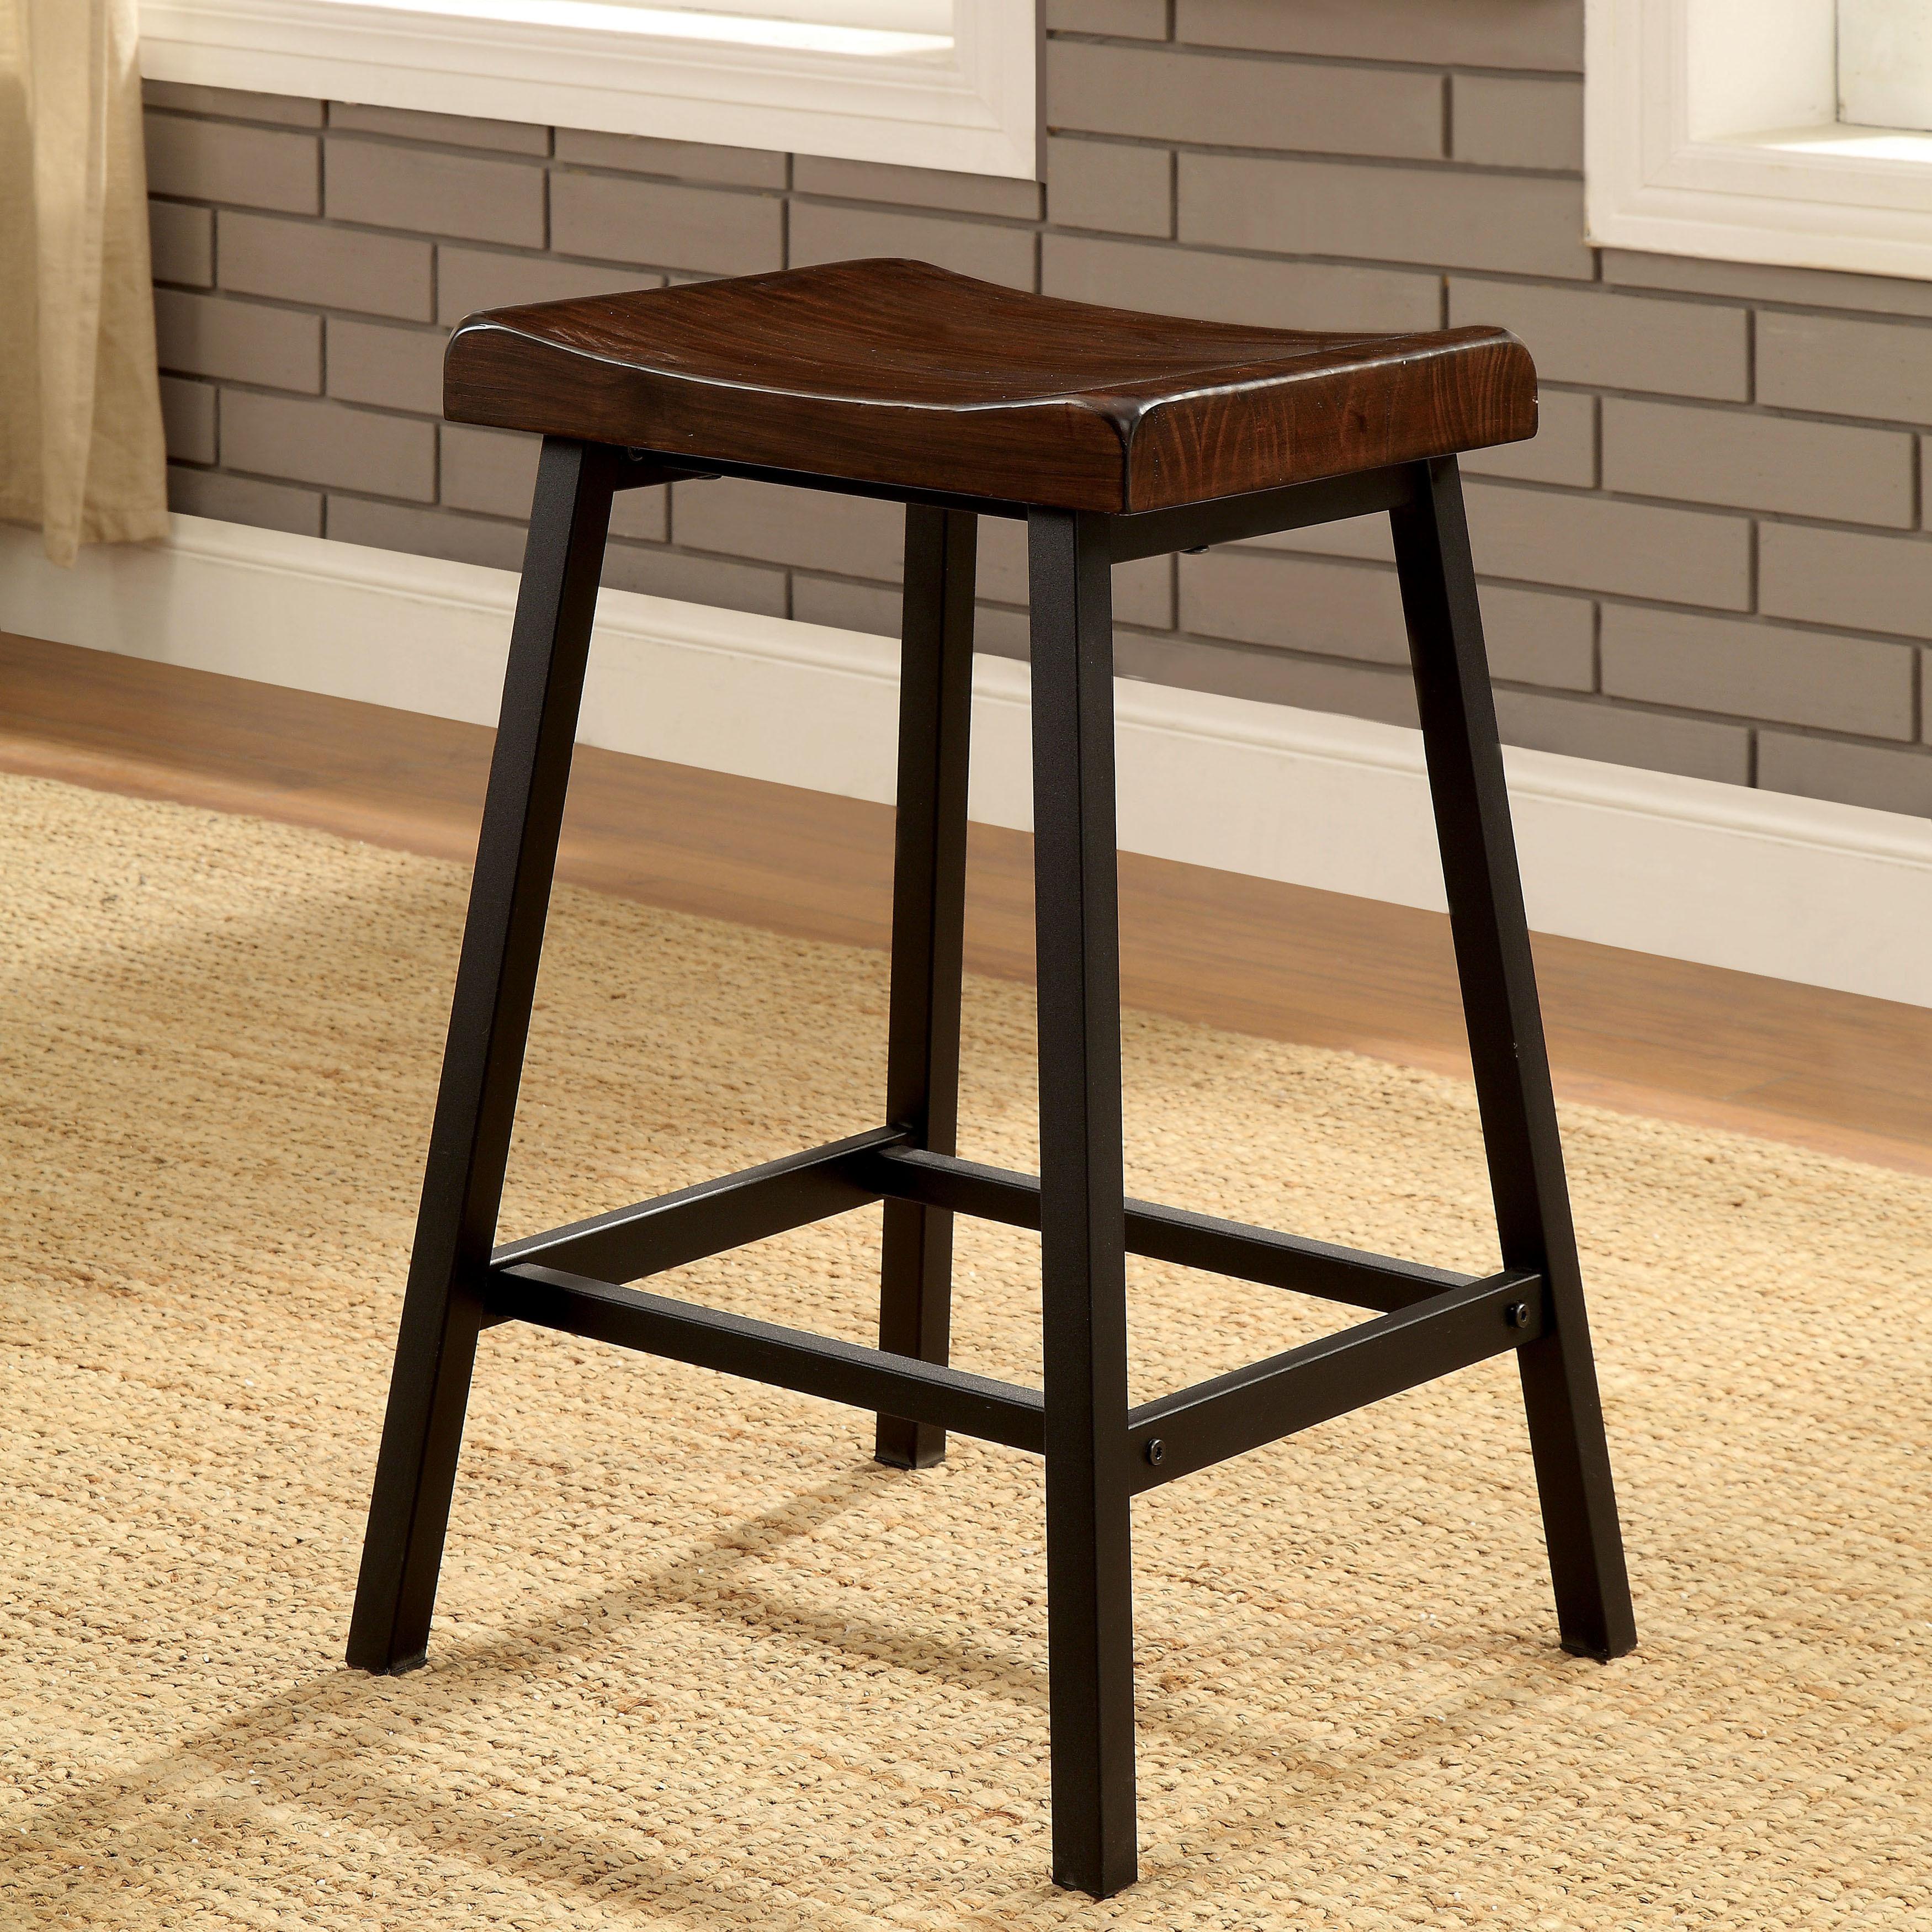 Magnificent Buy Rustic Counter Bar Stools Online At Overstock Our Inzonedesignstudio Interior Chair Design Inzonedesignstudiocom